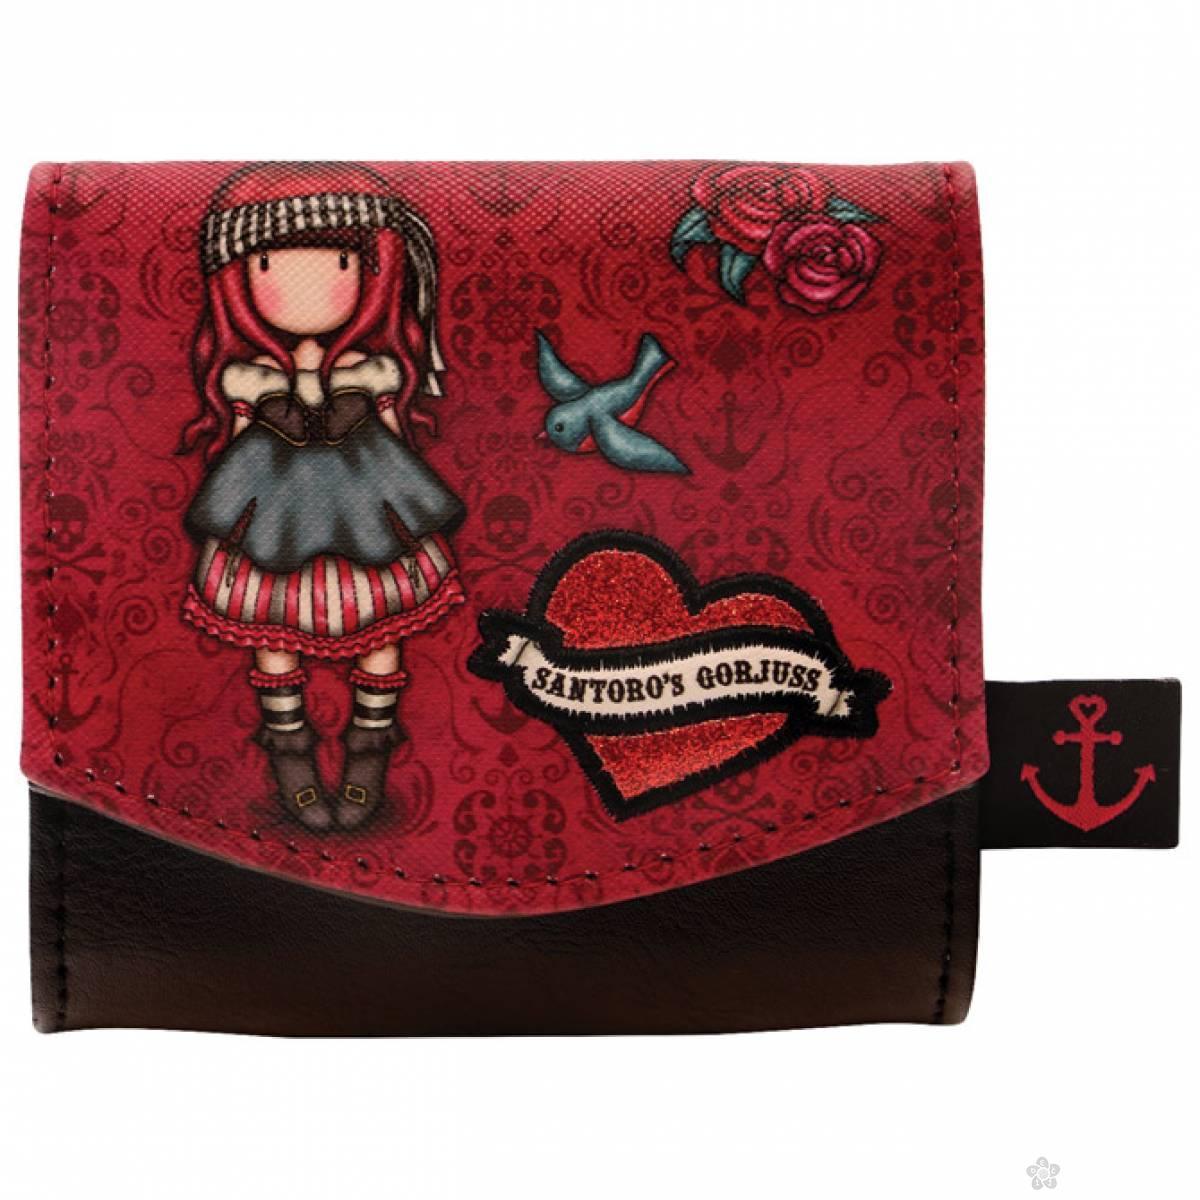 Novčanik na preklop Mary Rose 1074GJ02